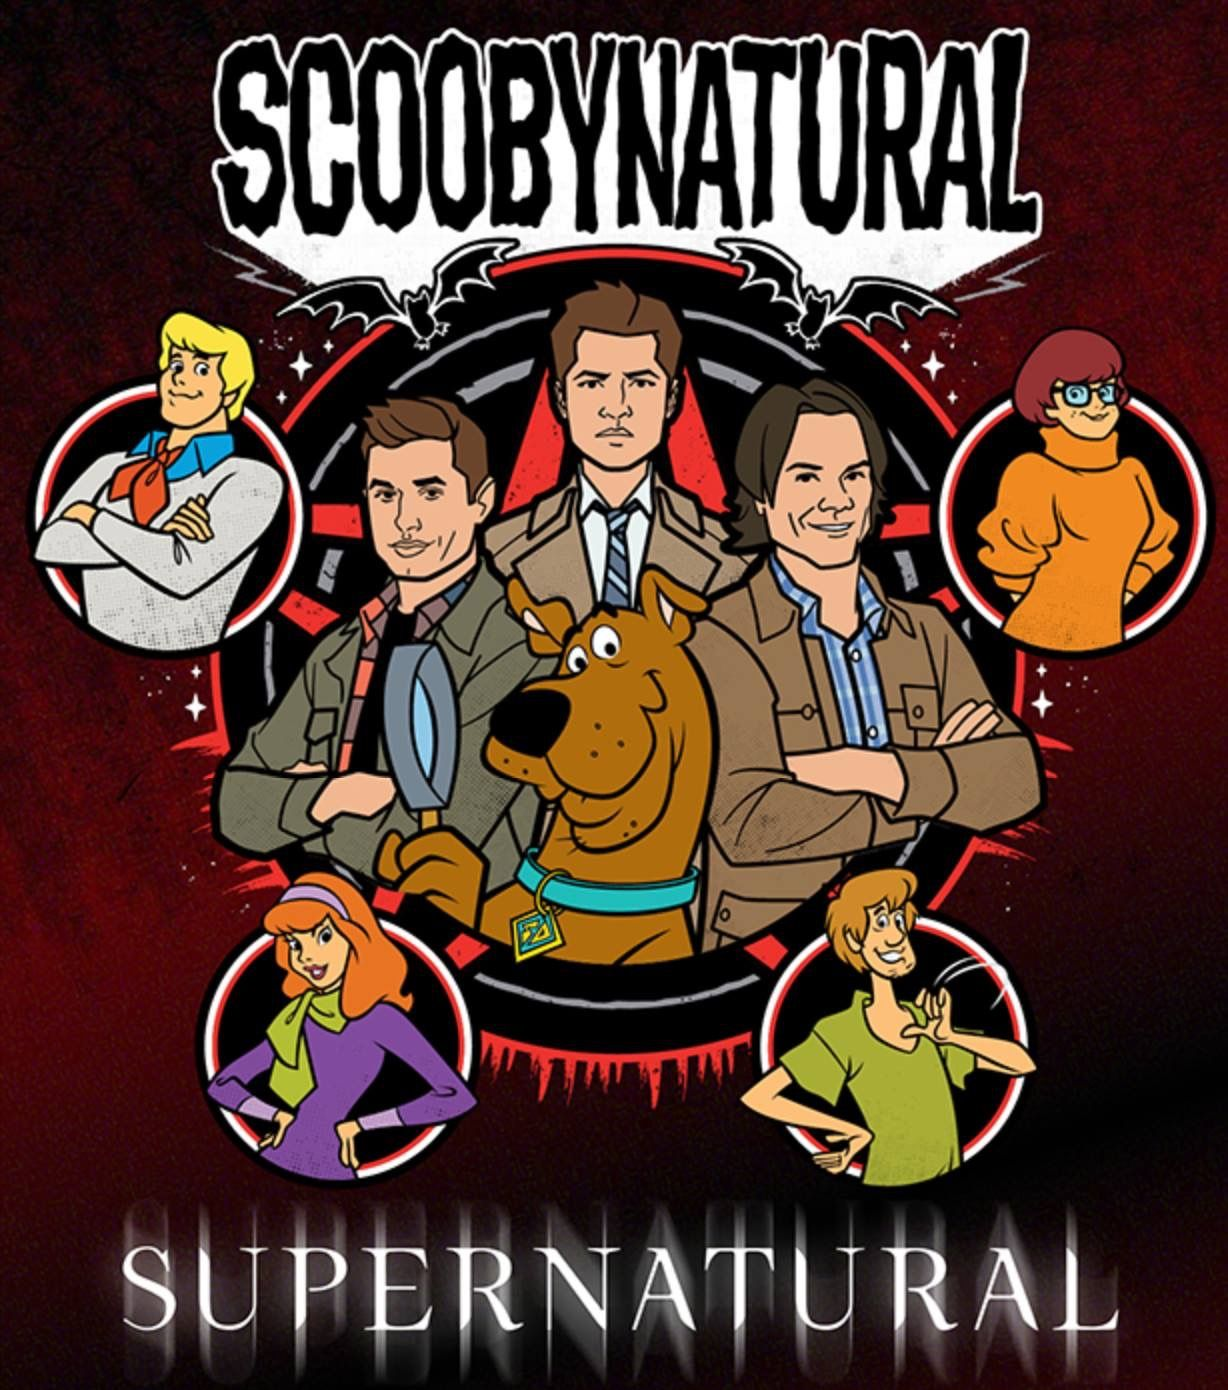 SCOOBYNATURAL(supernatural) Dessins supernatural, Dessin